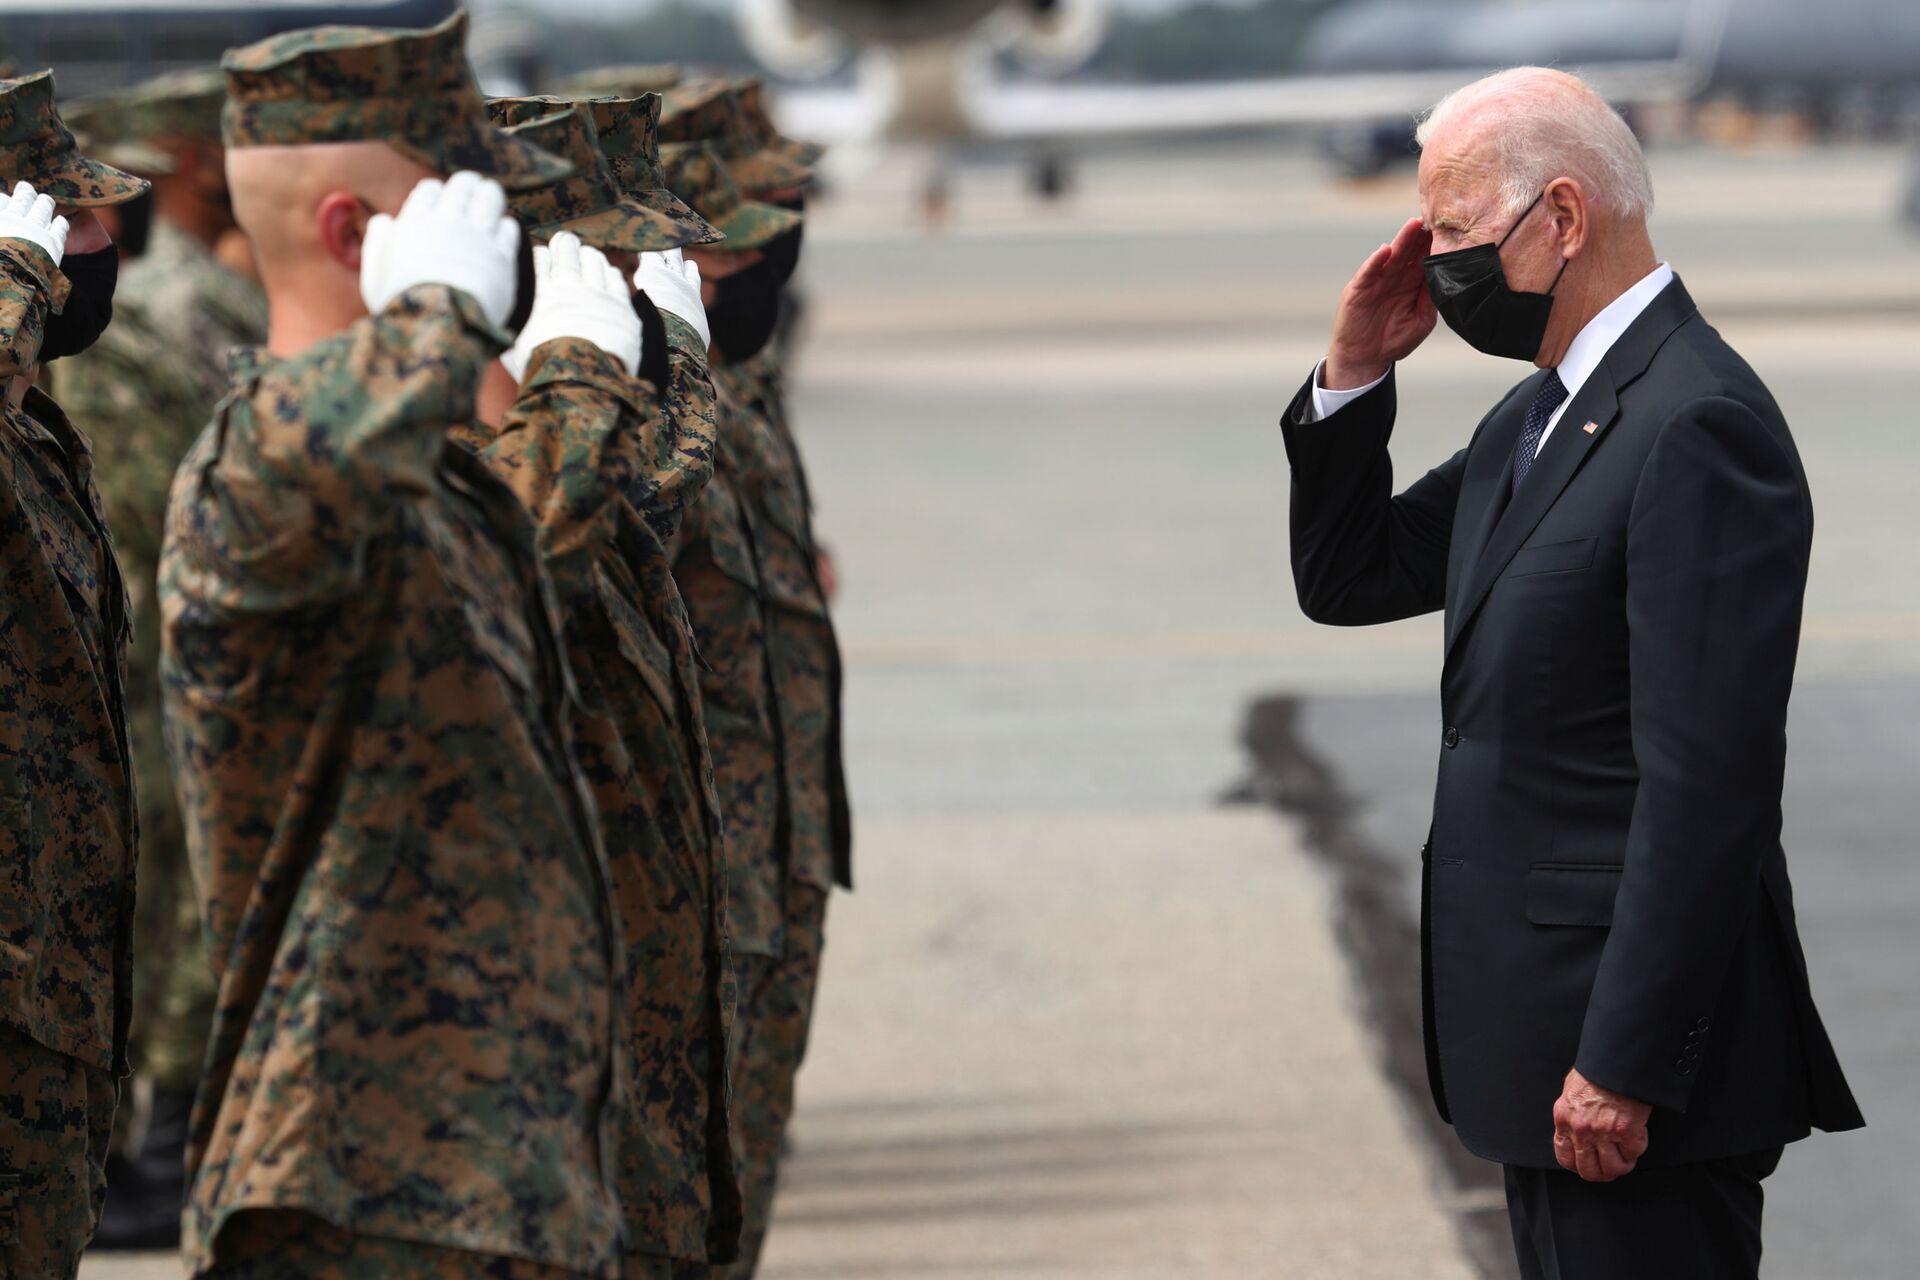 U.S. President Joe Biden salutes members of the U.S. Marine Corps Honor Guard before boarding Air Force One at Dover Air Force Base in Dover, Delaware, U.S., August 29, 2021 - Sputnik International, 1920, 10.09.2021